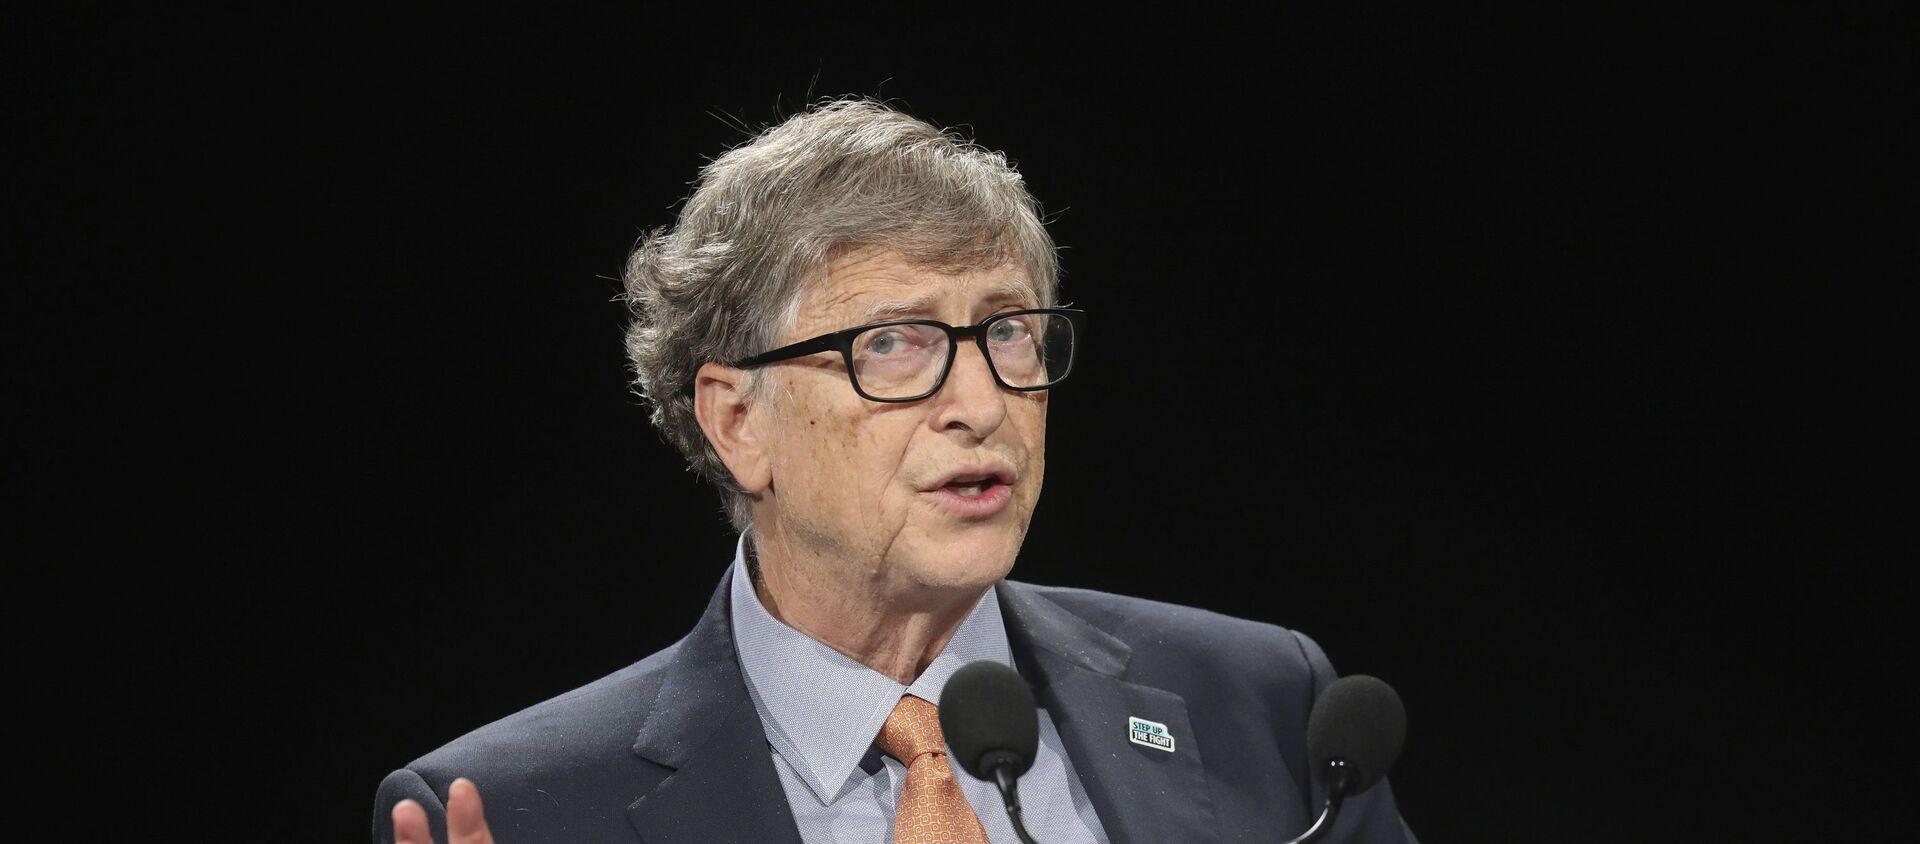 Bill Gates - Sputnik Türkiye, 1920, 24.04.2021